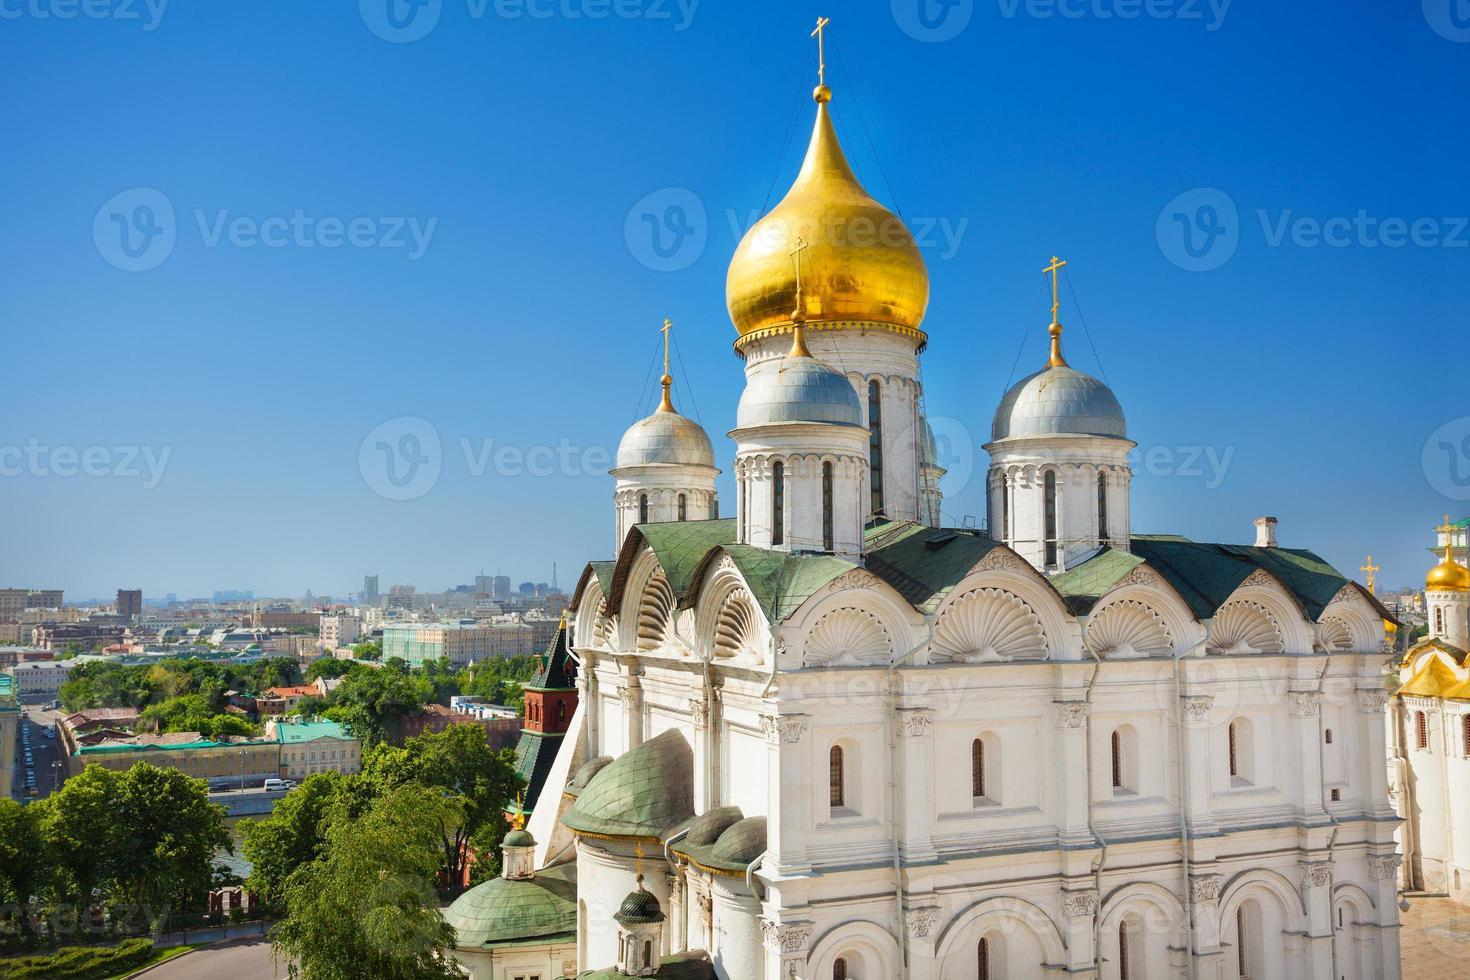 vista della cupola del palazzo del patriarca, Cremlino di Mosca foto